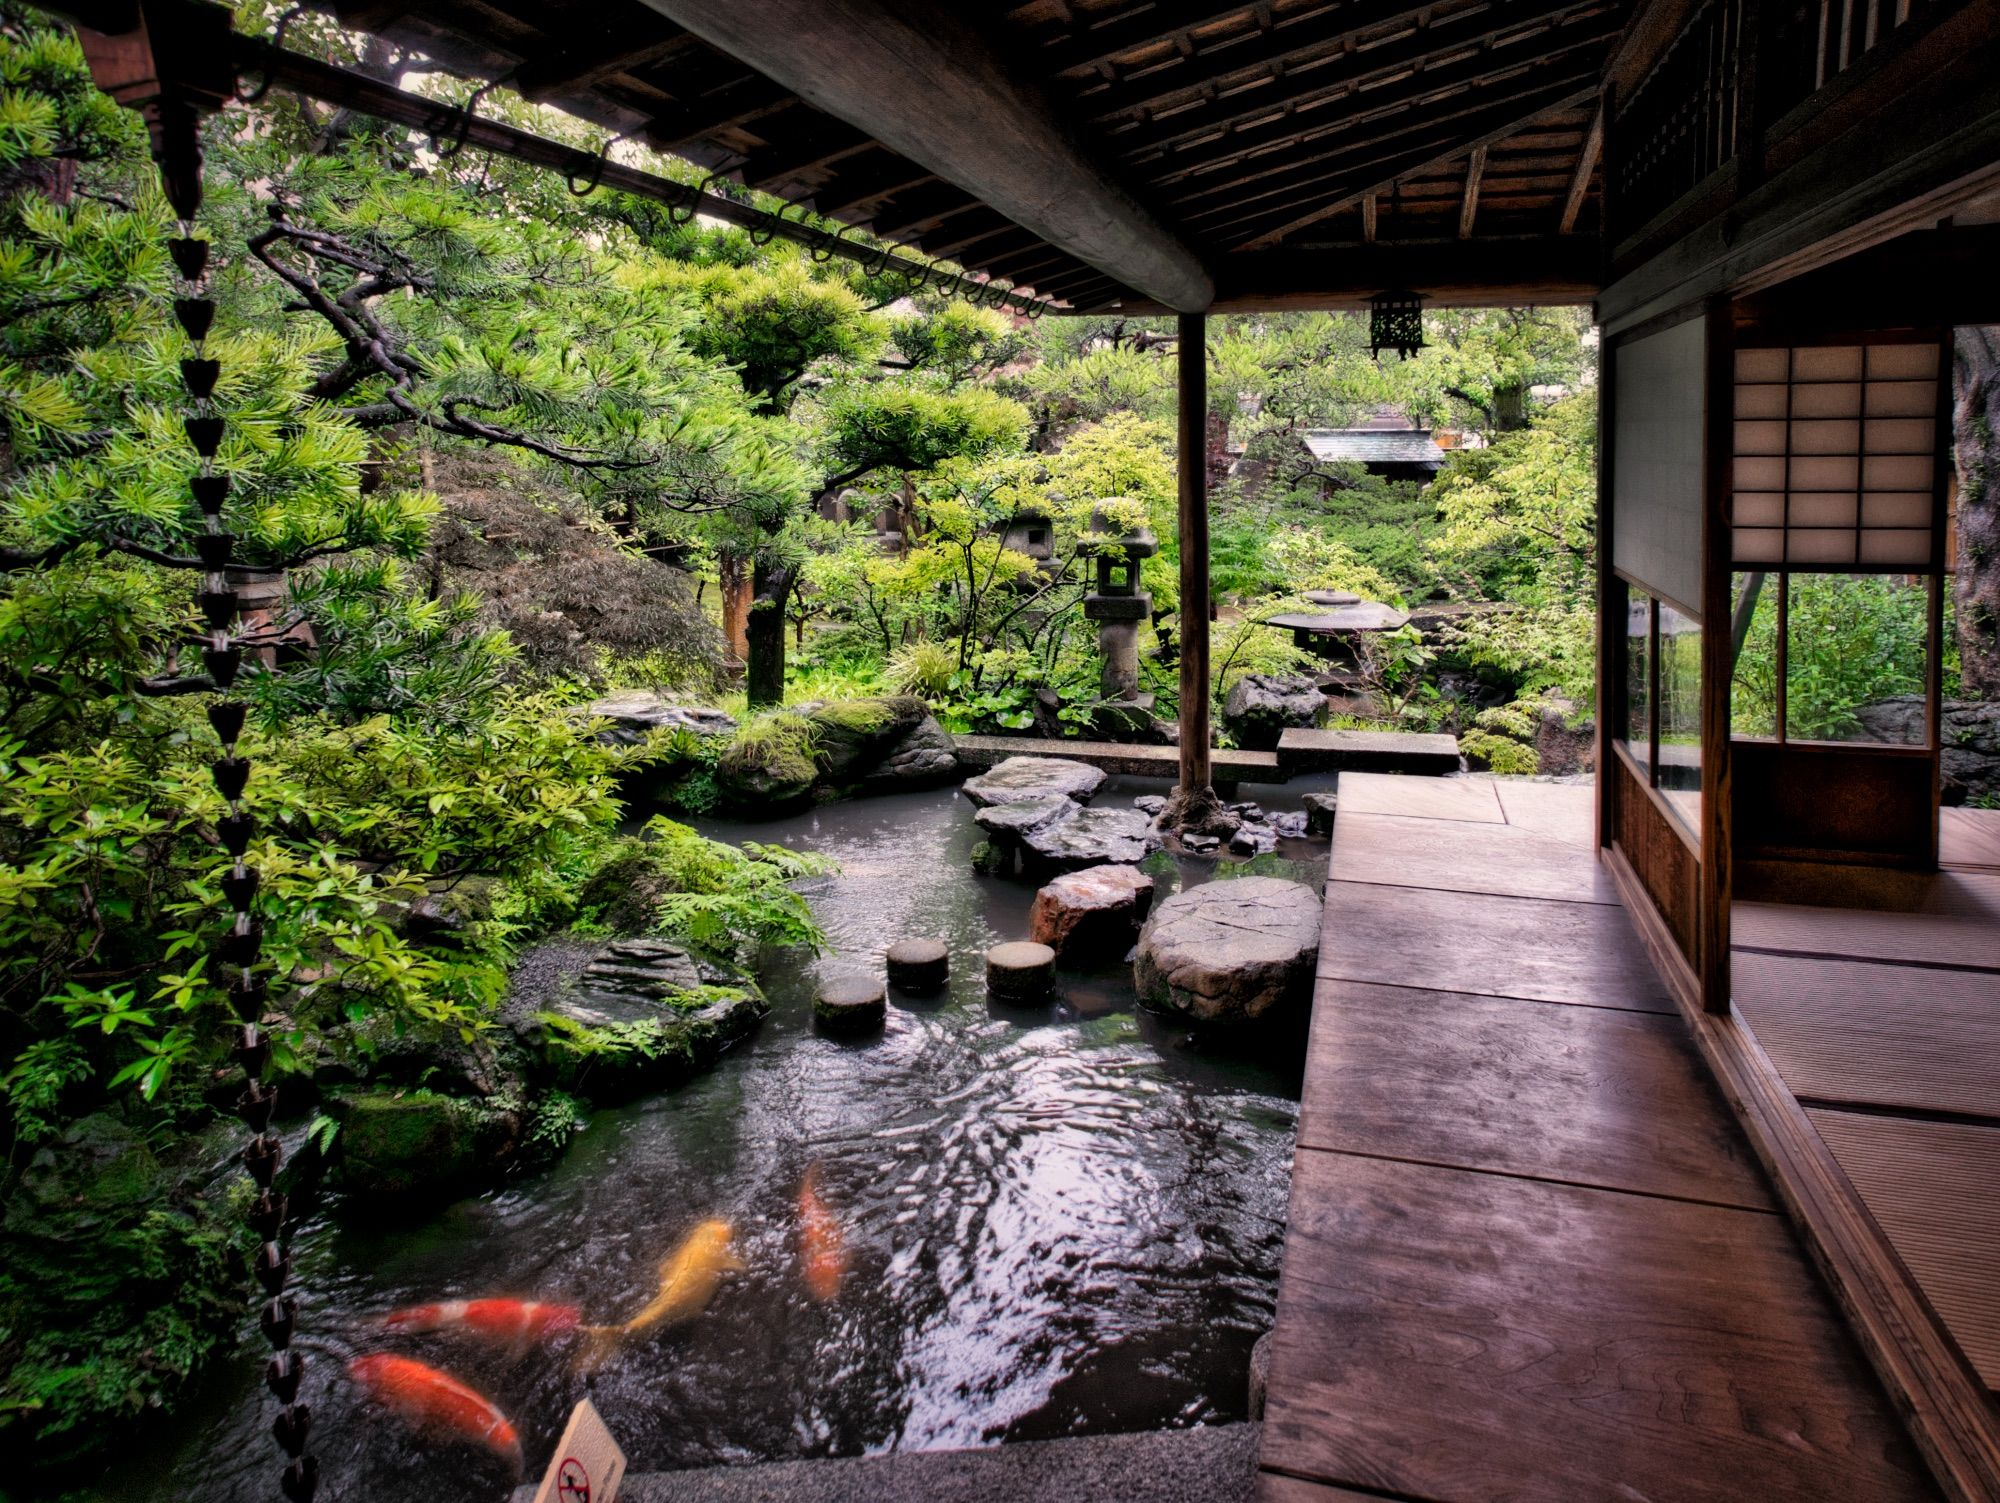 kanazawa japan stone lantern garden carp travel